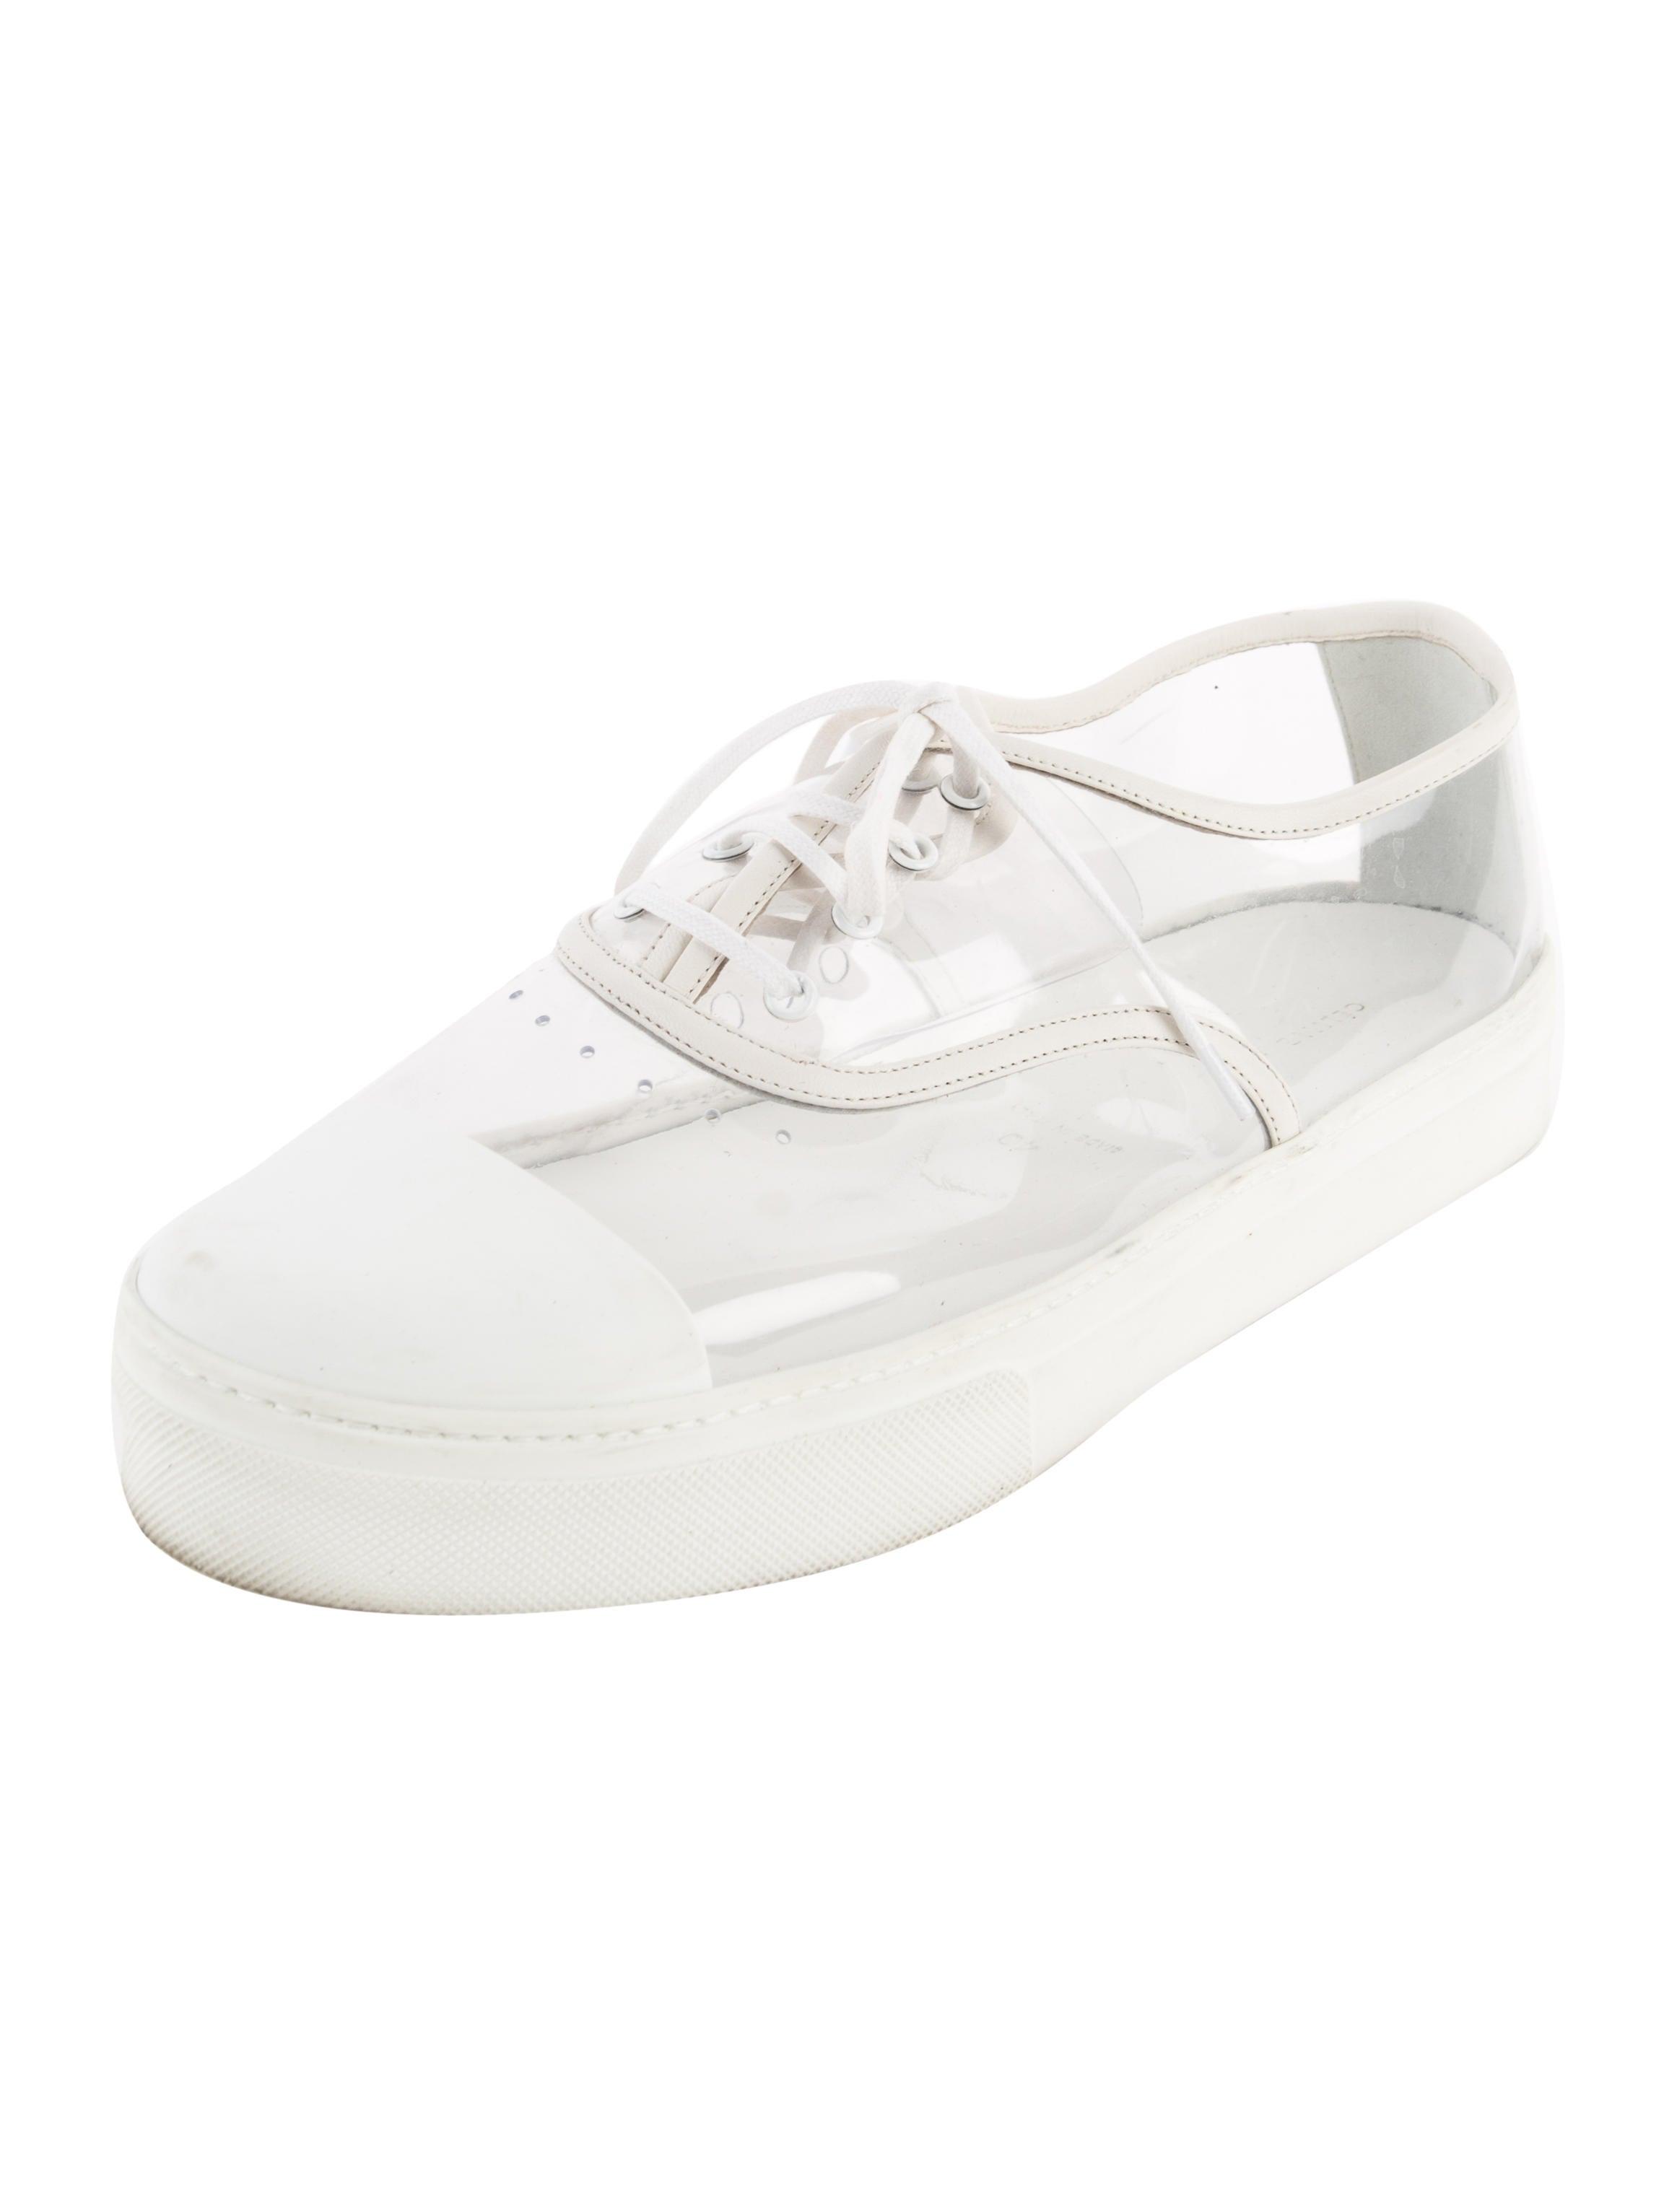 Céline PVC Low-Top Sneakers sale fake 2015 for sale rAyepVK6P